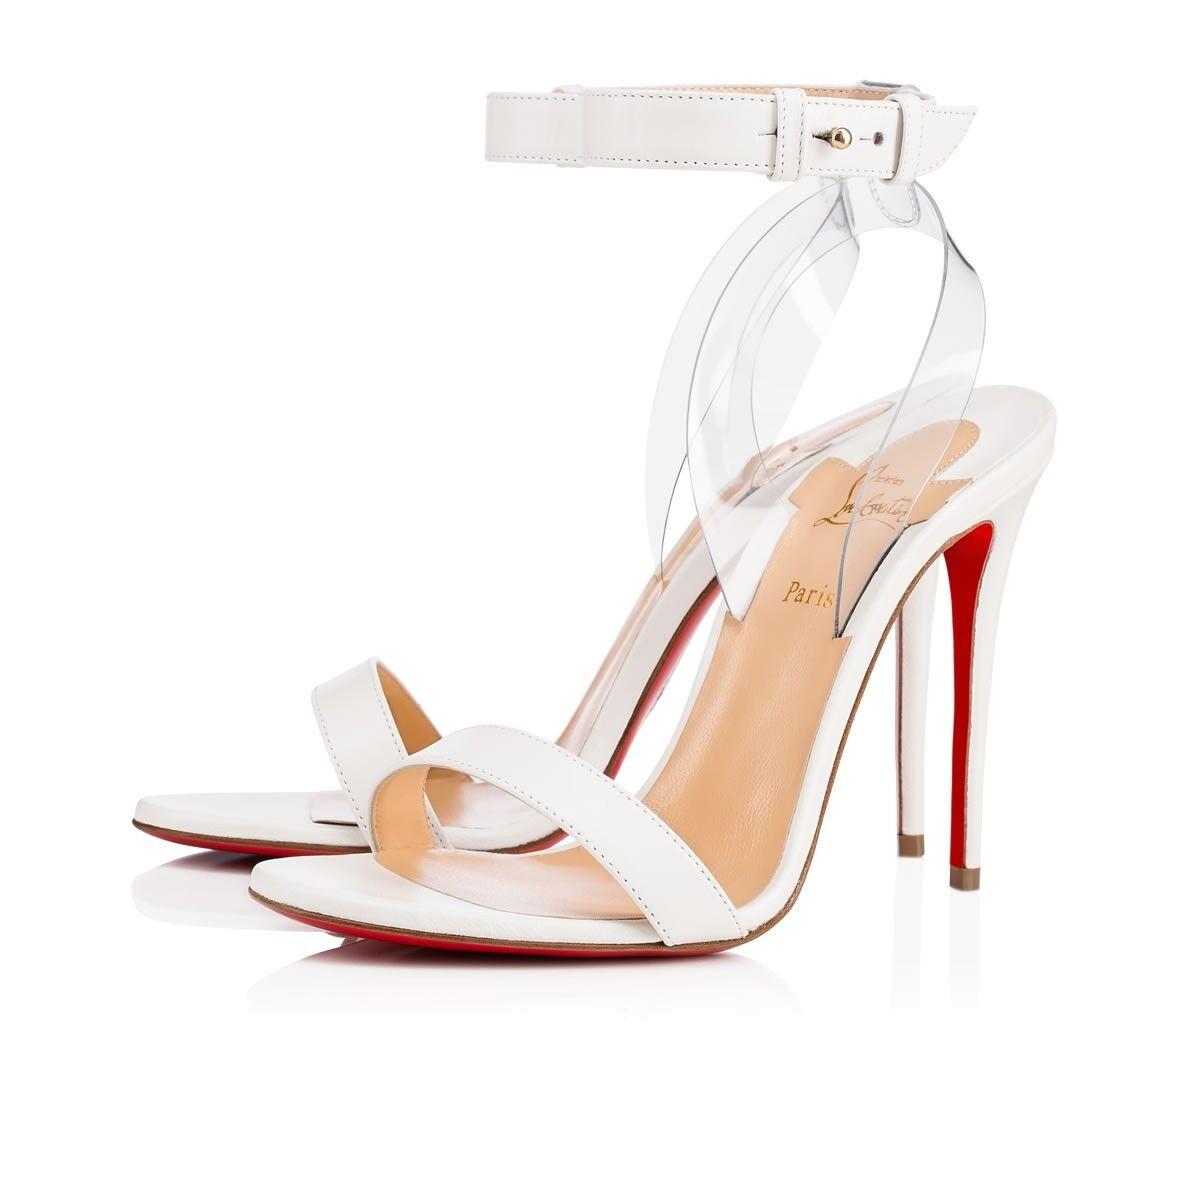 NIB Christian Louboutin Jonatina 100 blanc PVC Ankle Strap Sandal Heel Pump 38